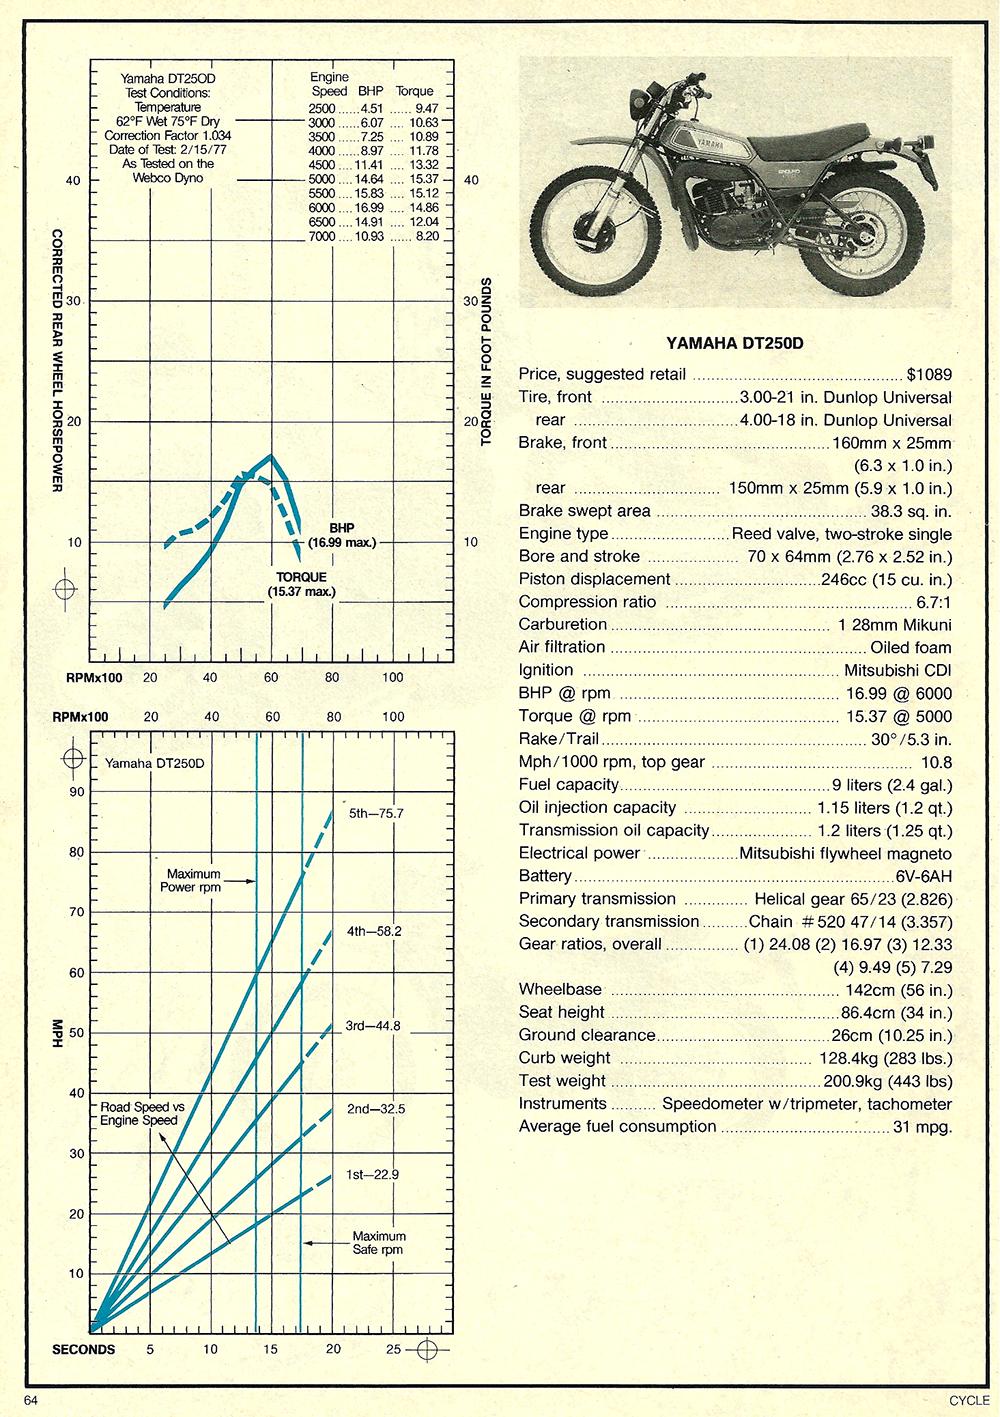 1977 Yamaha DT250D road test 4.jpg